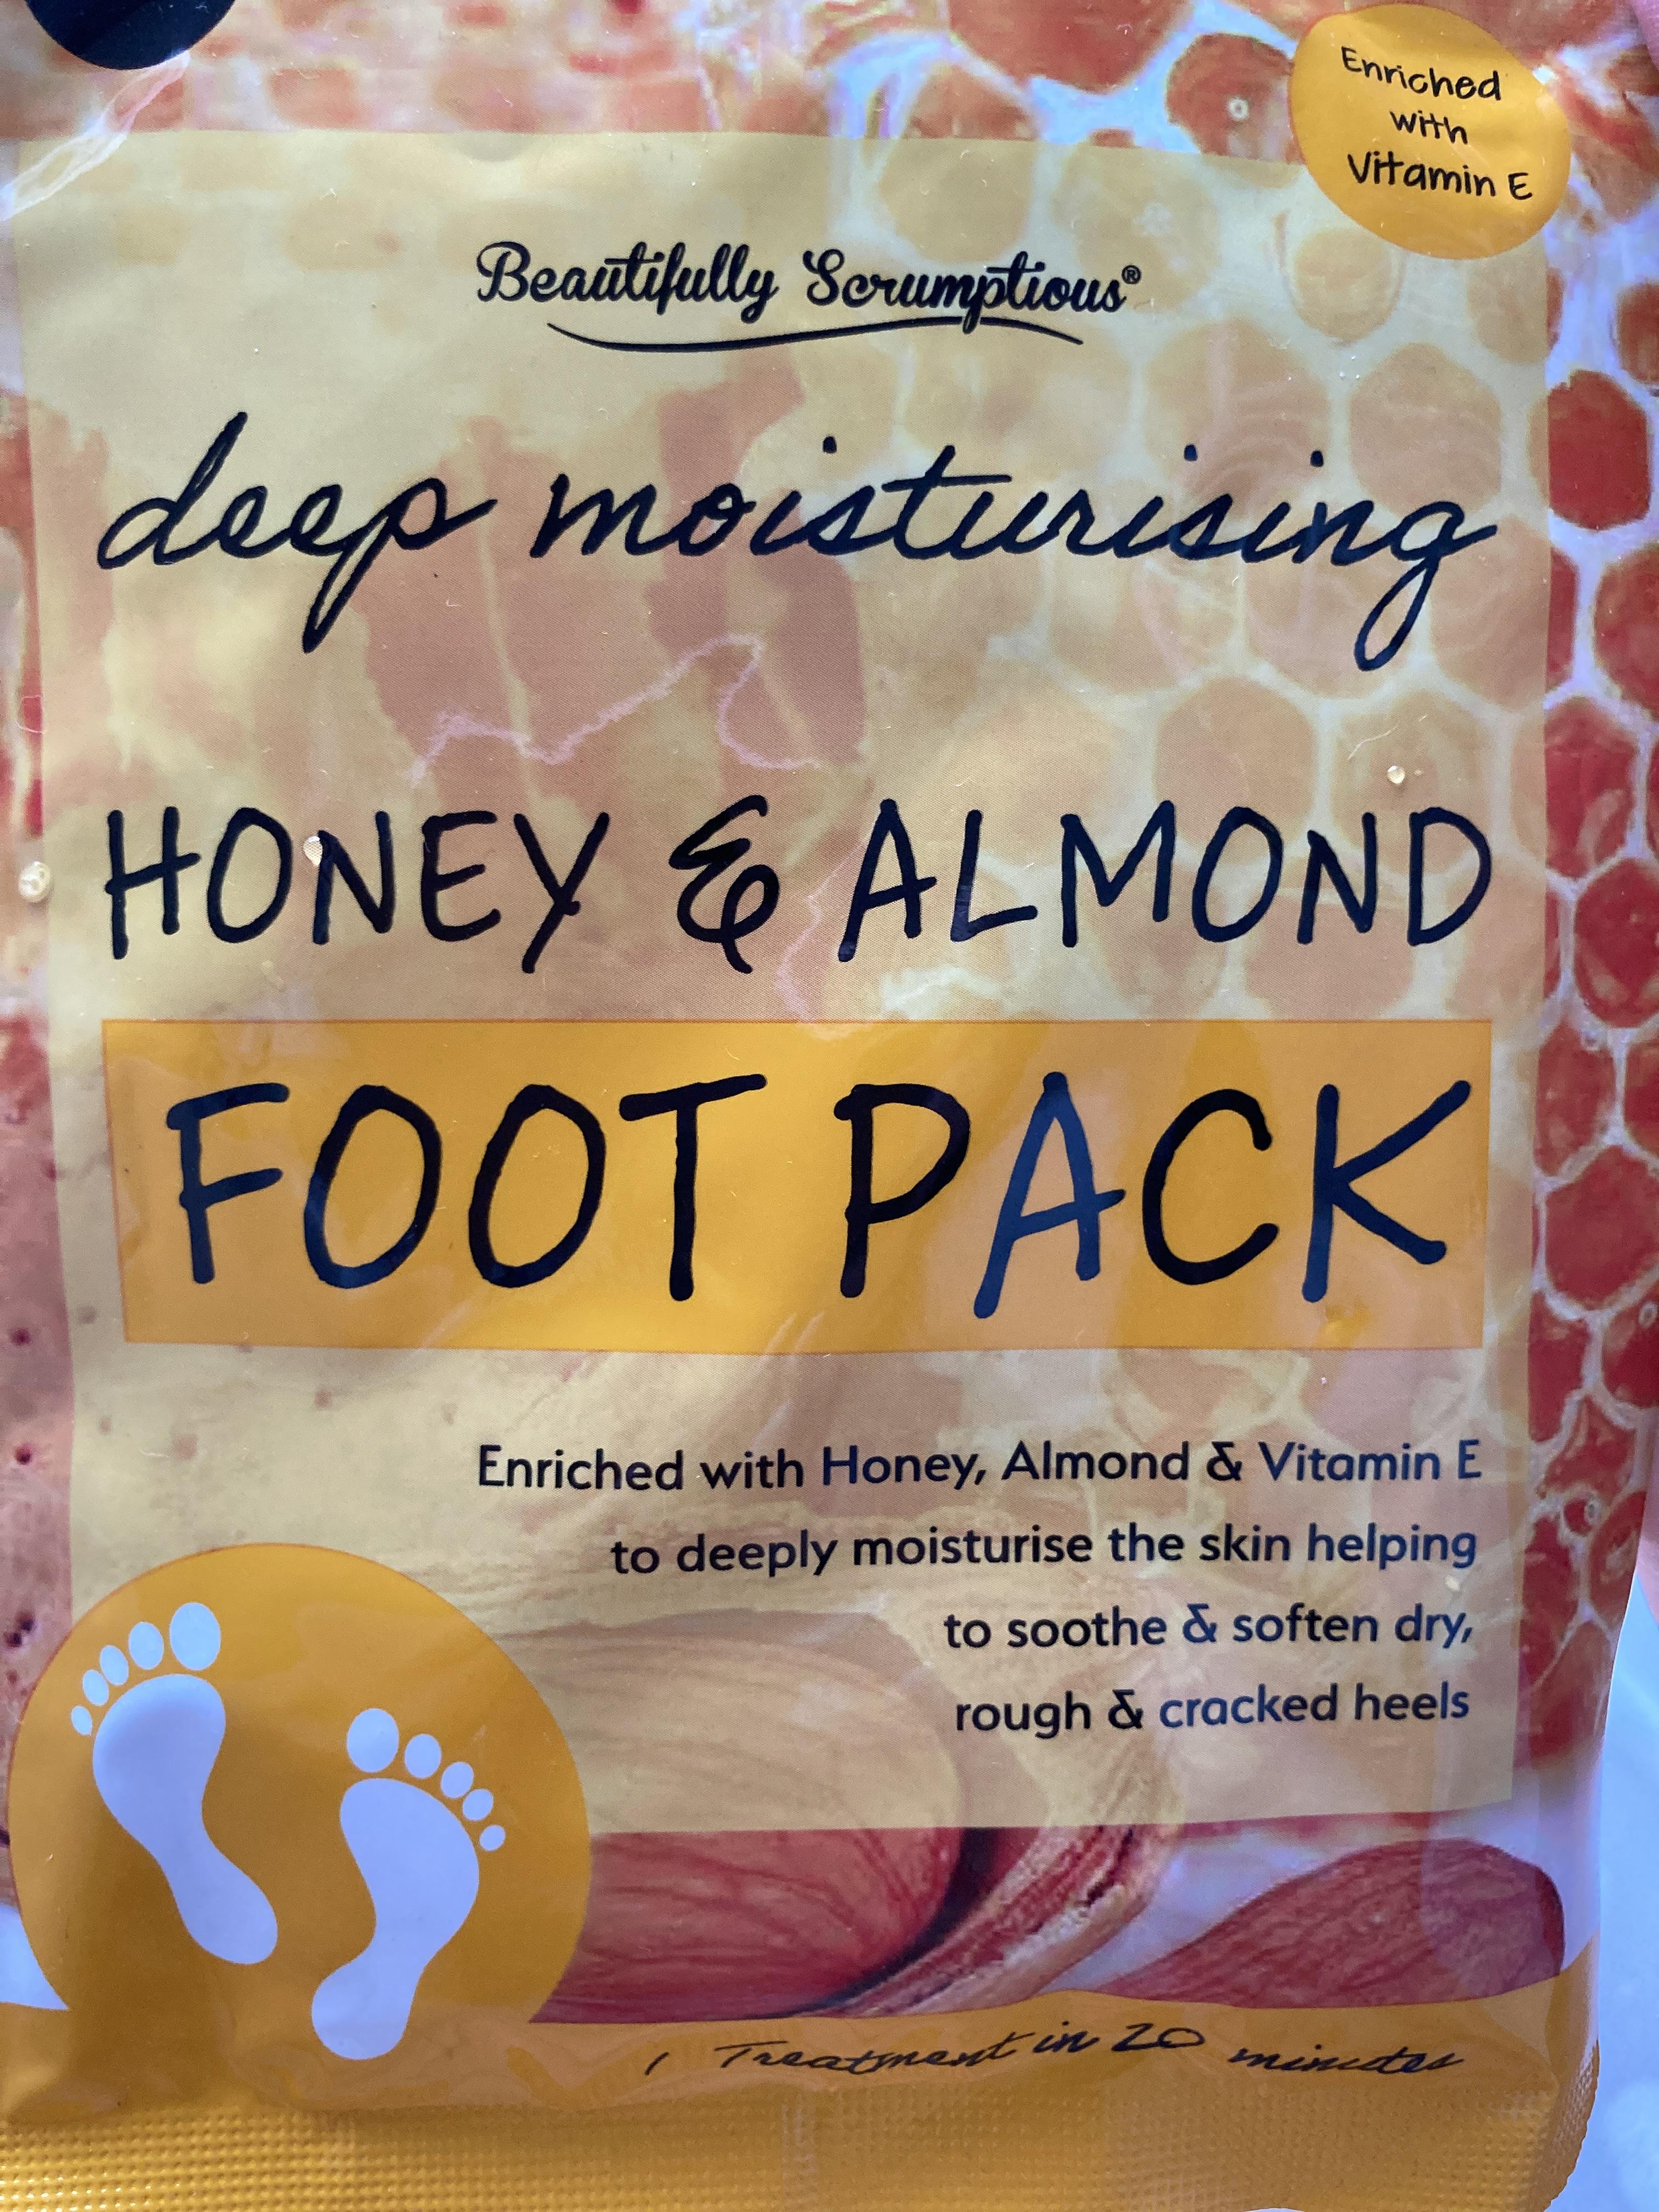 Beautifully Scrumptious Deep Moisturising Honey And Almond Foot Pack